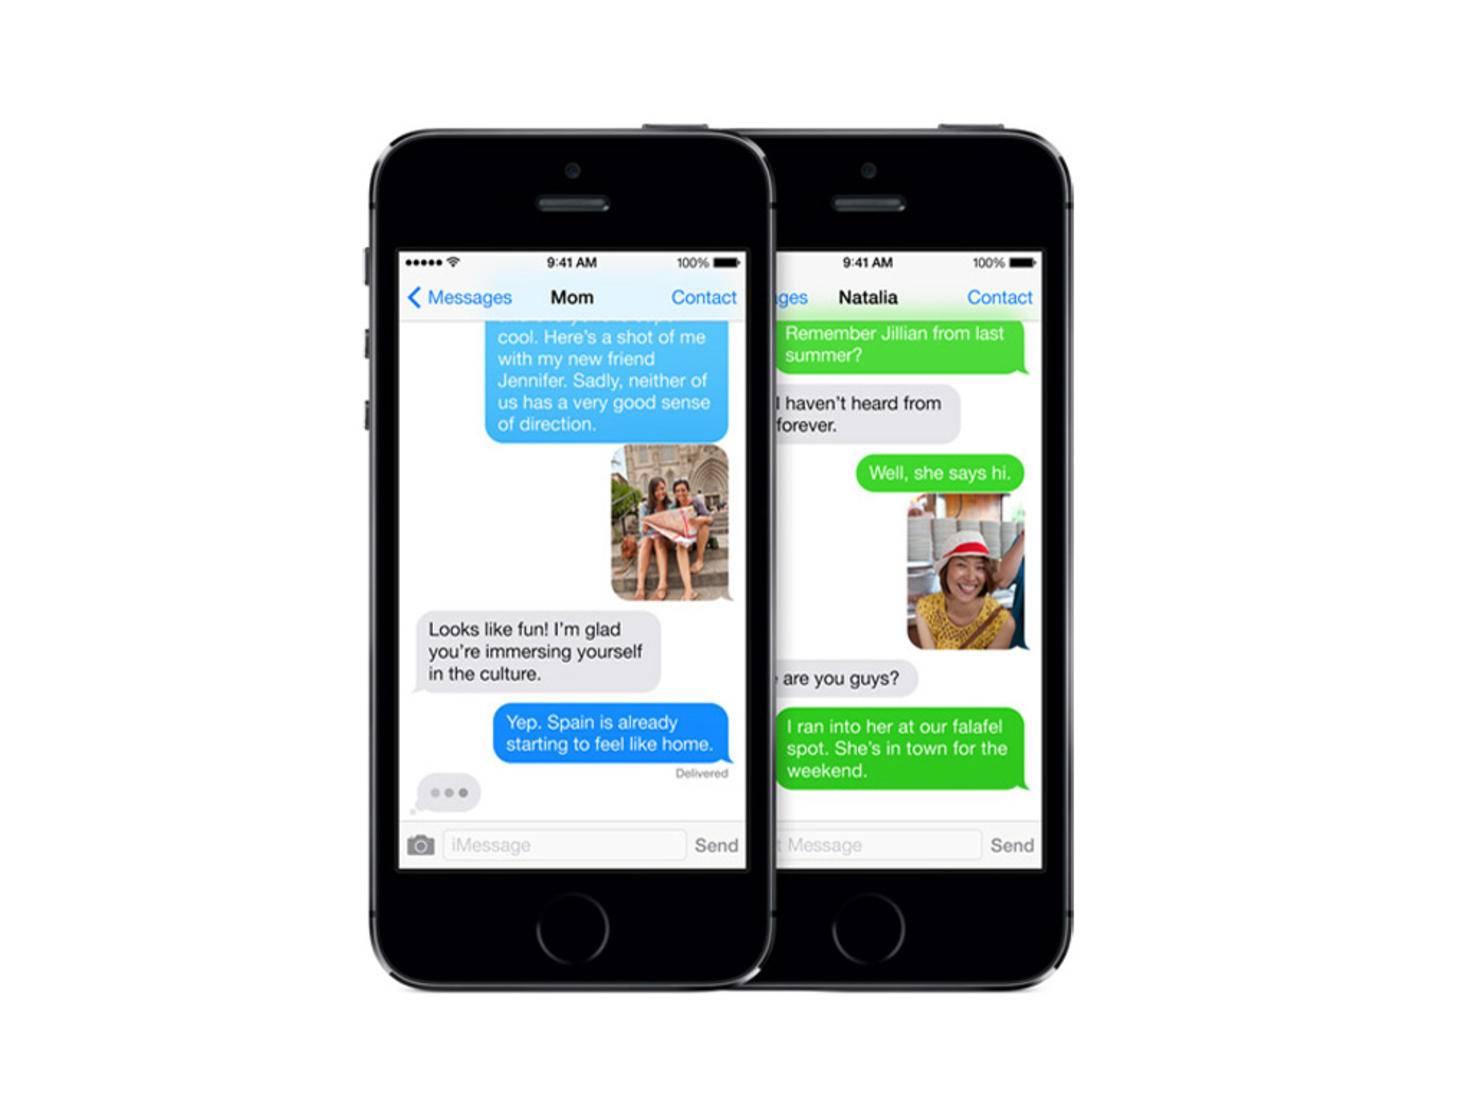 iPhone-6-imessage